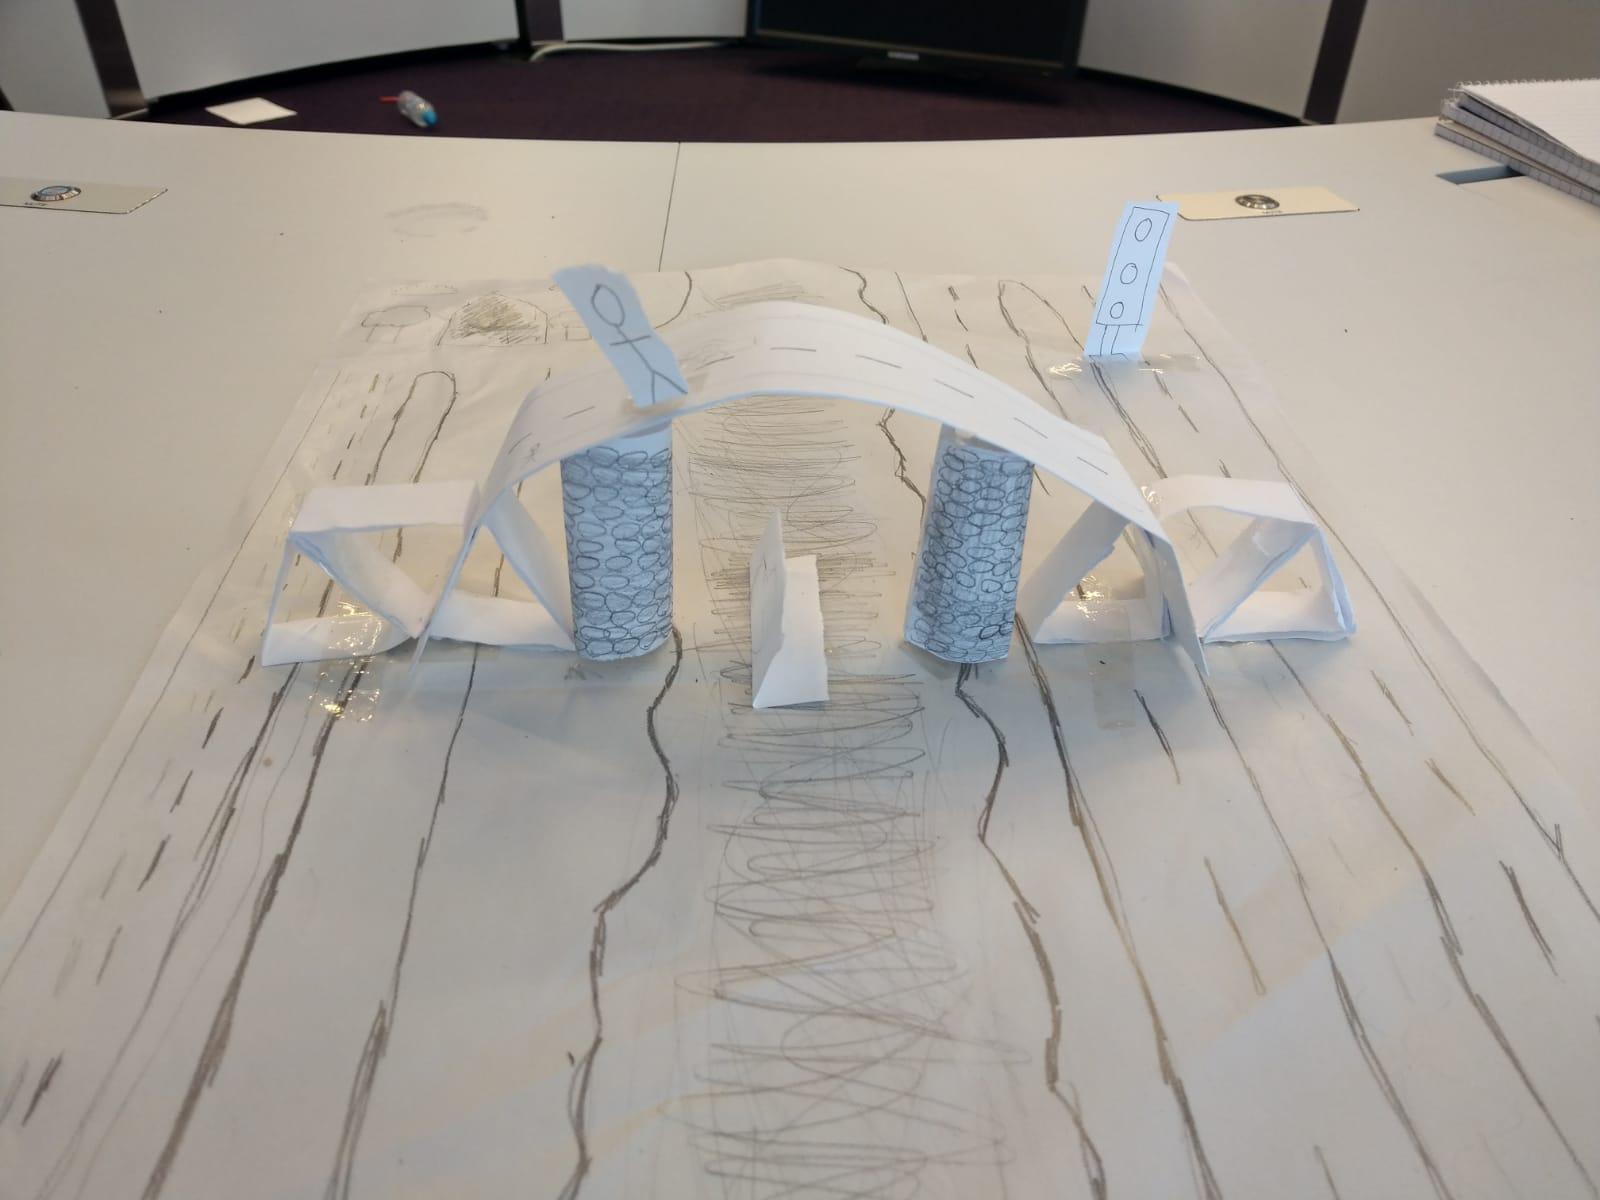 An innovative bridge design